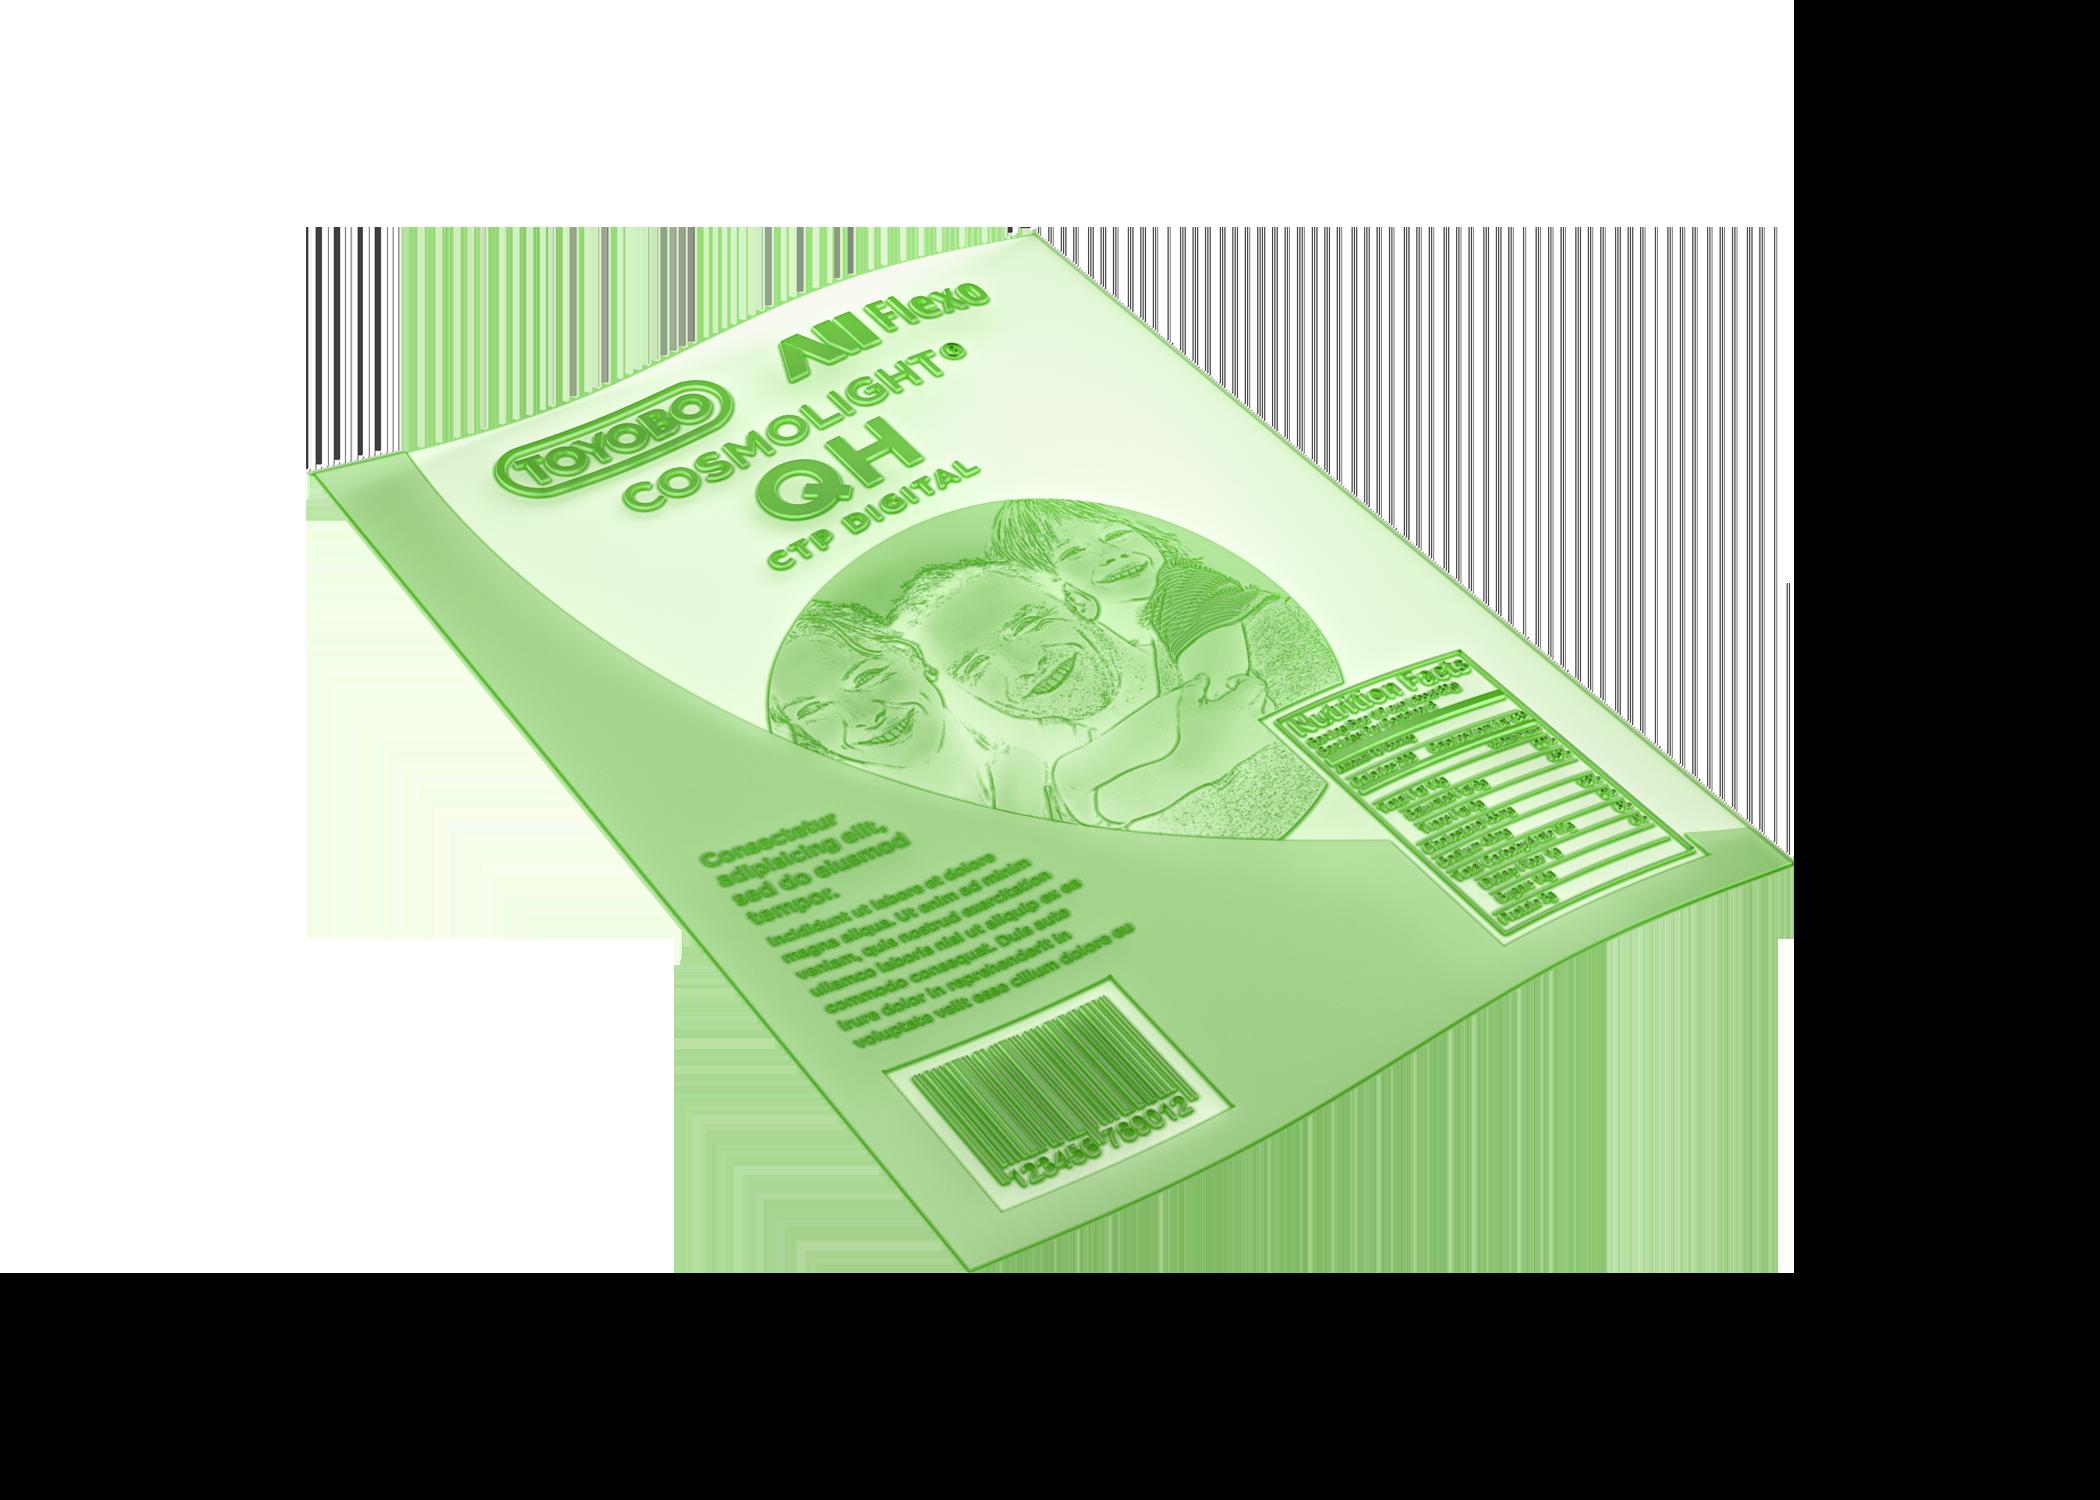 Toyobo-Cosmolight QZ-Water Washable Printing Plate-AllFlexo